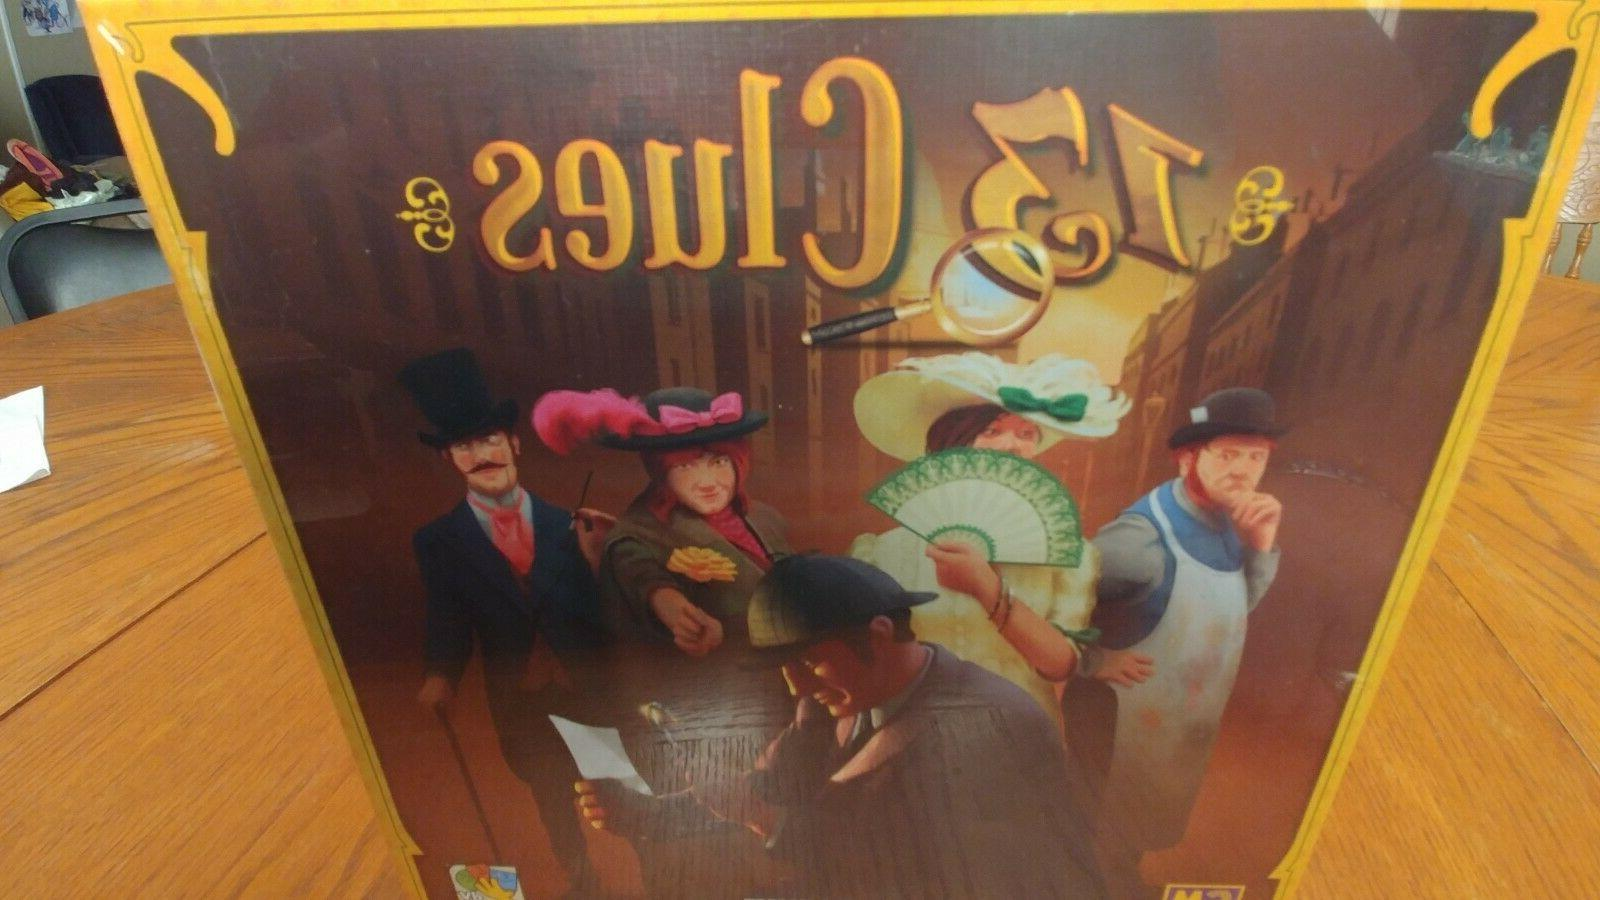 13 clues board game games scotland yard